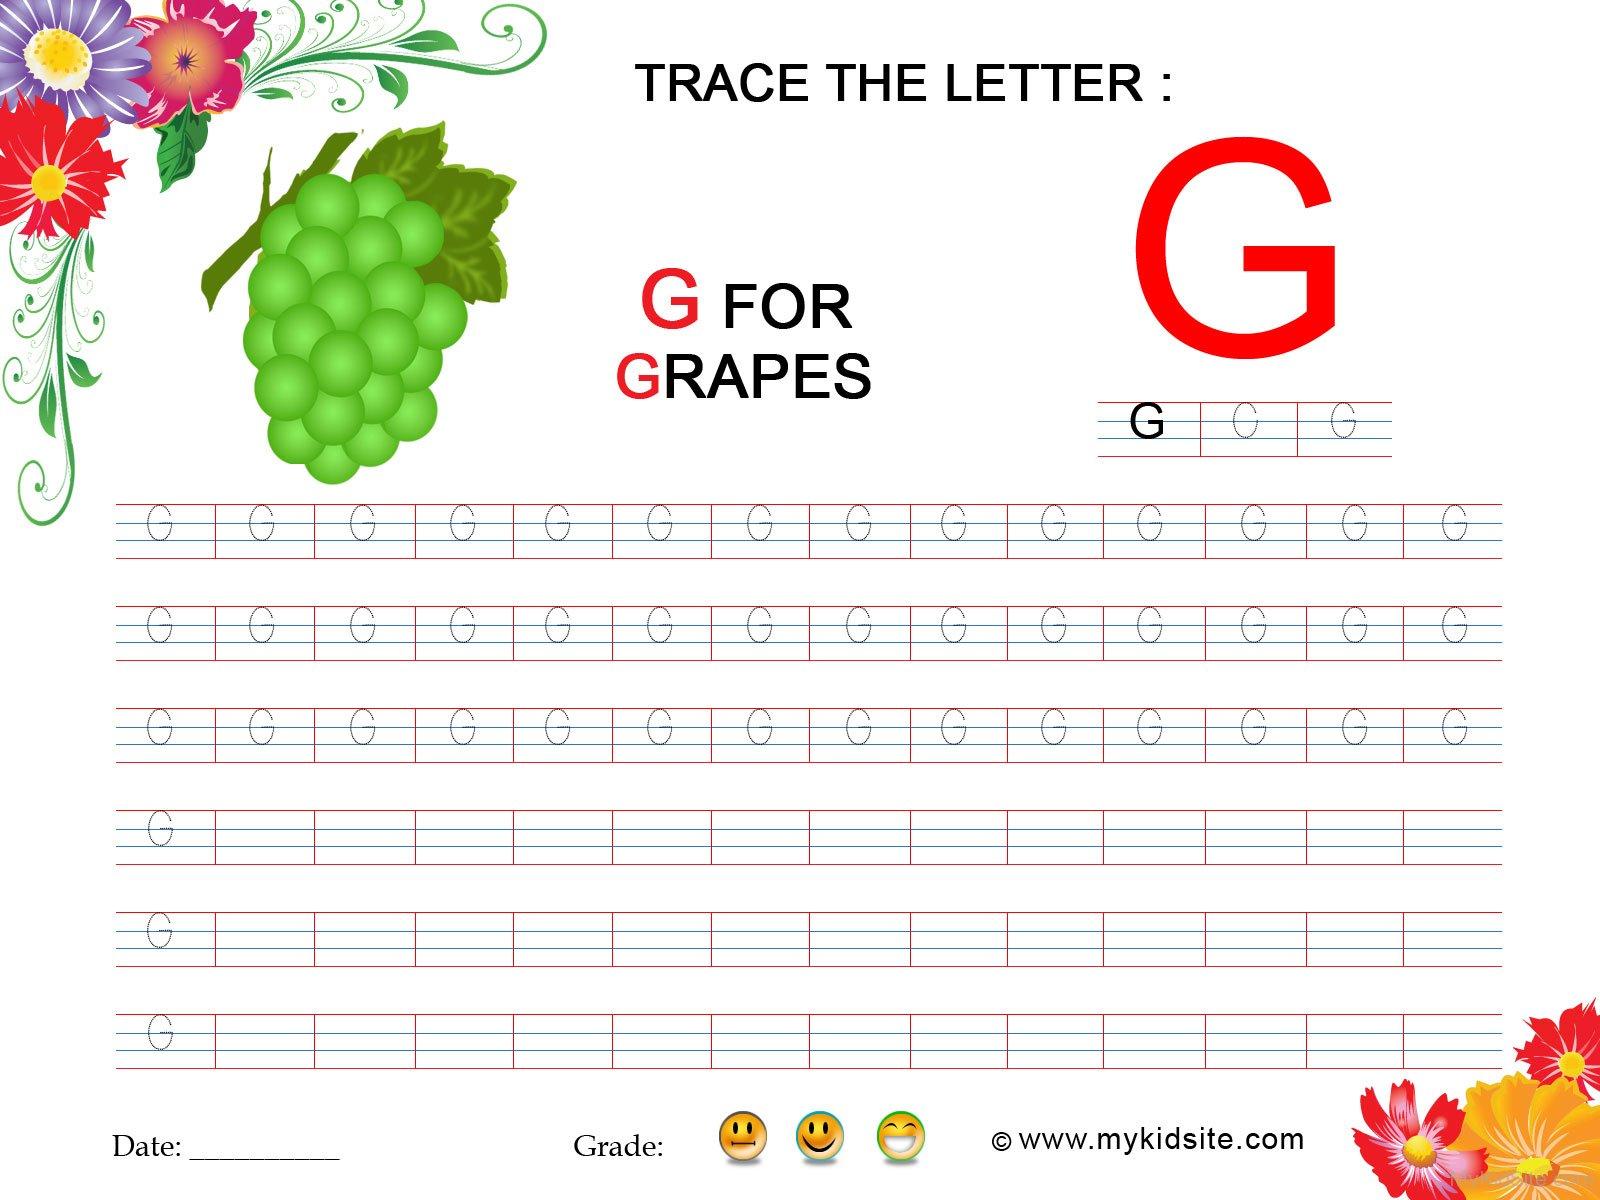 Tracing Worksheet For Letter G